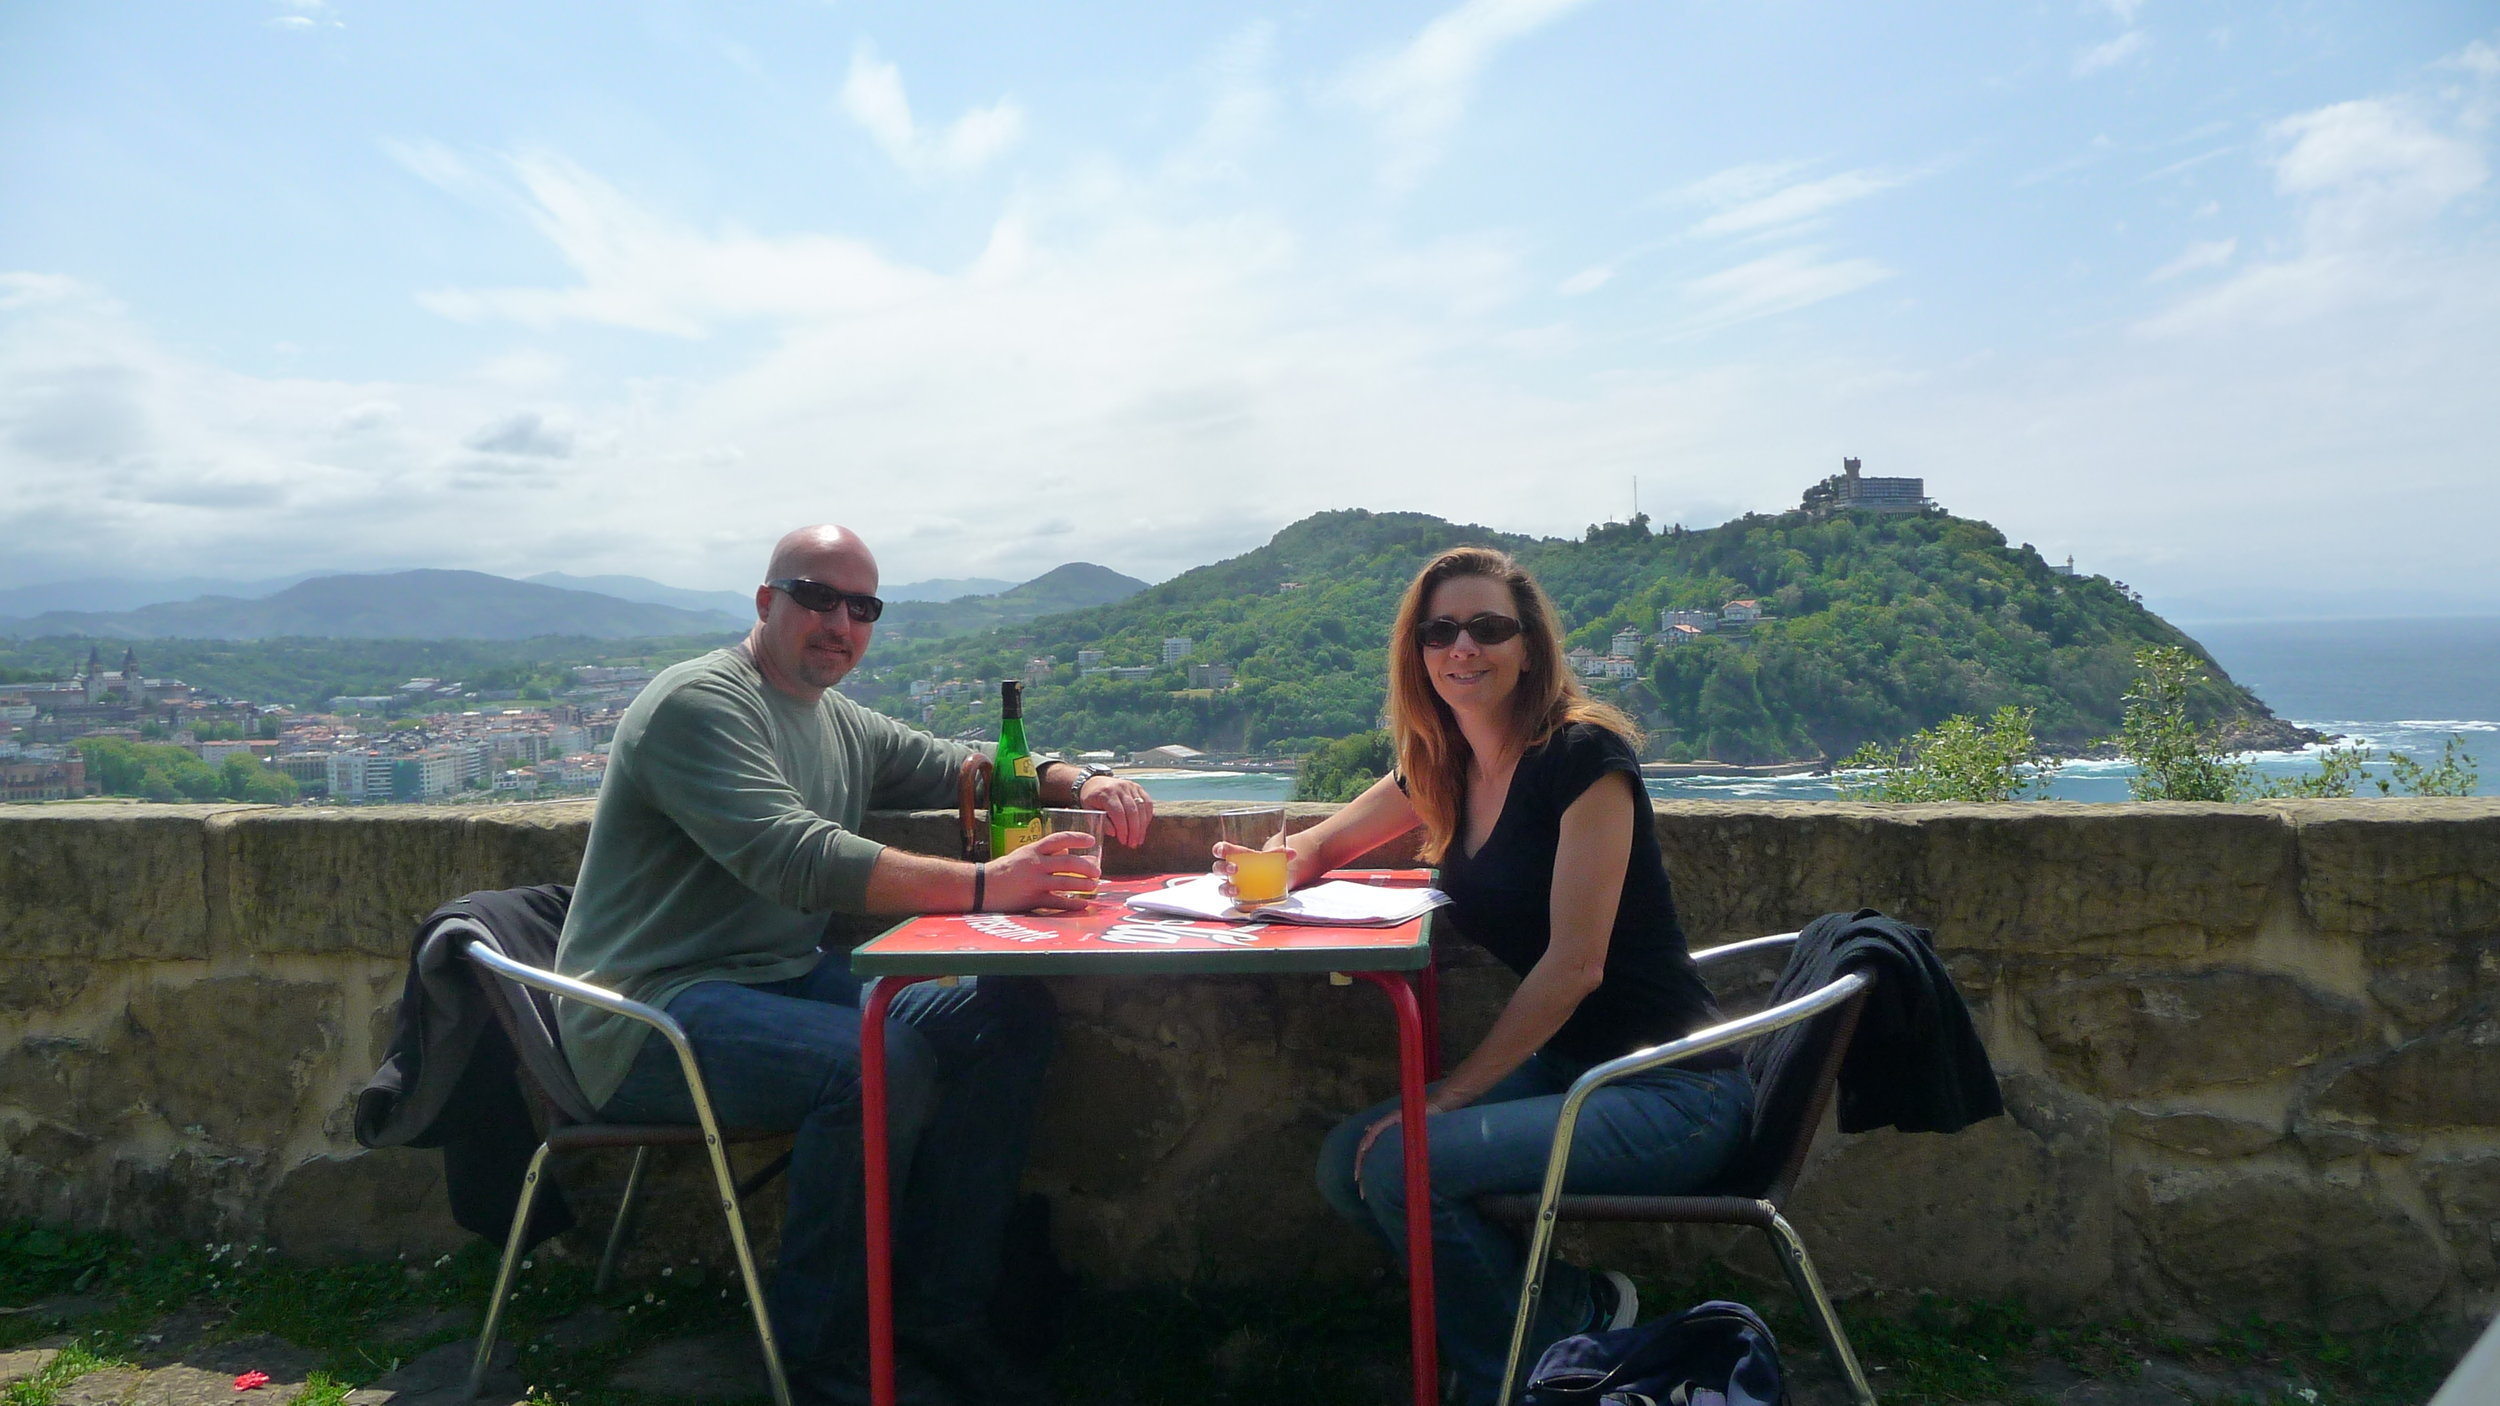 Dan & Viki enjoying cider atop Monte Urgull